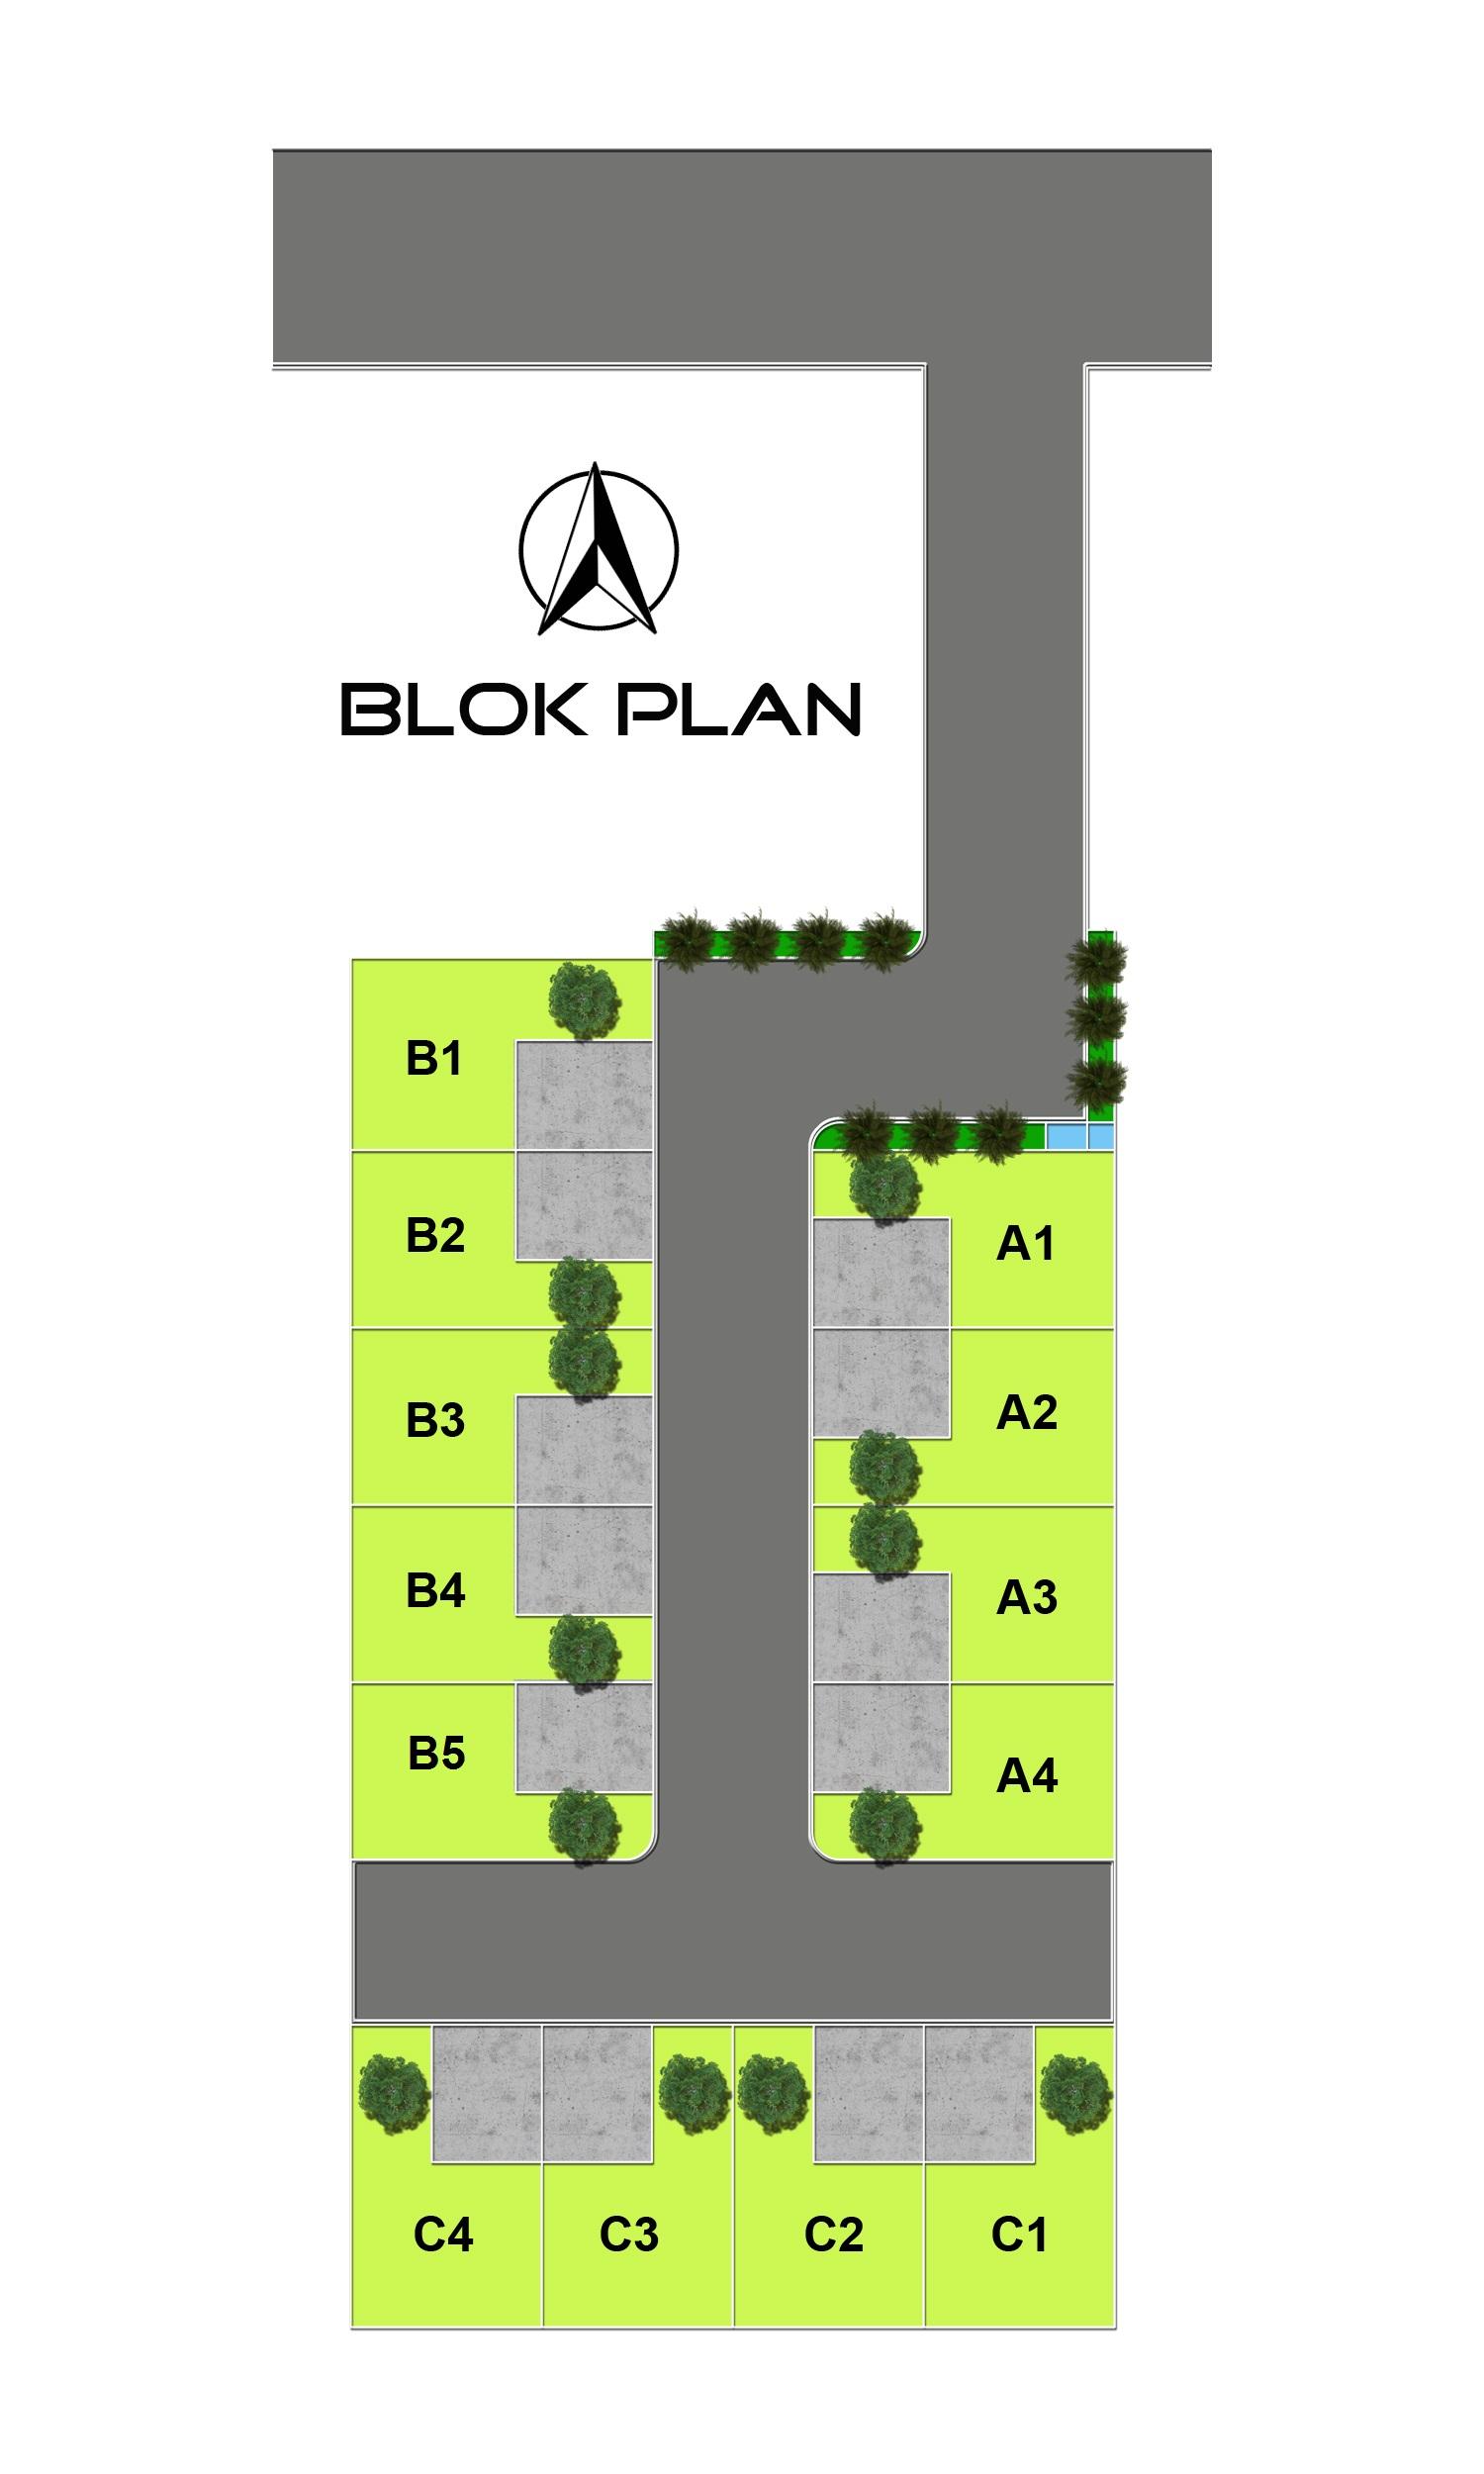 080616-site-plan-brosur